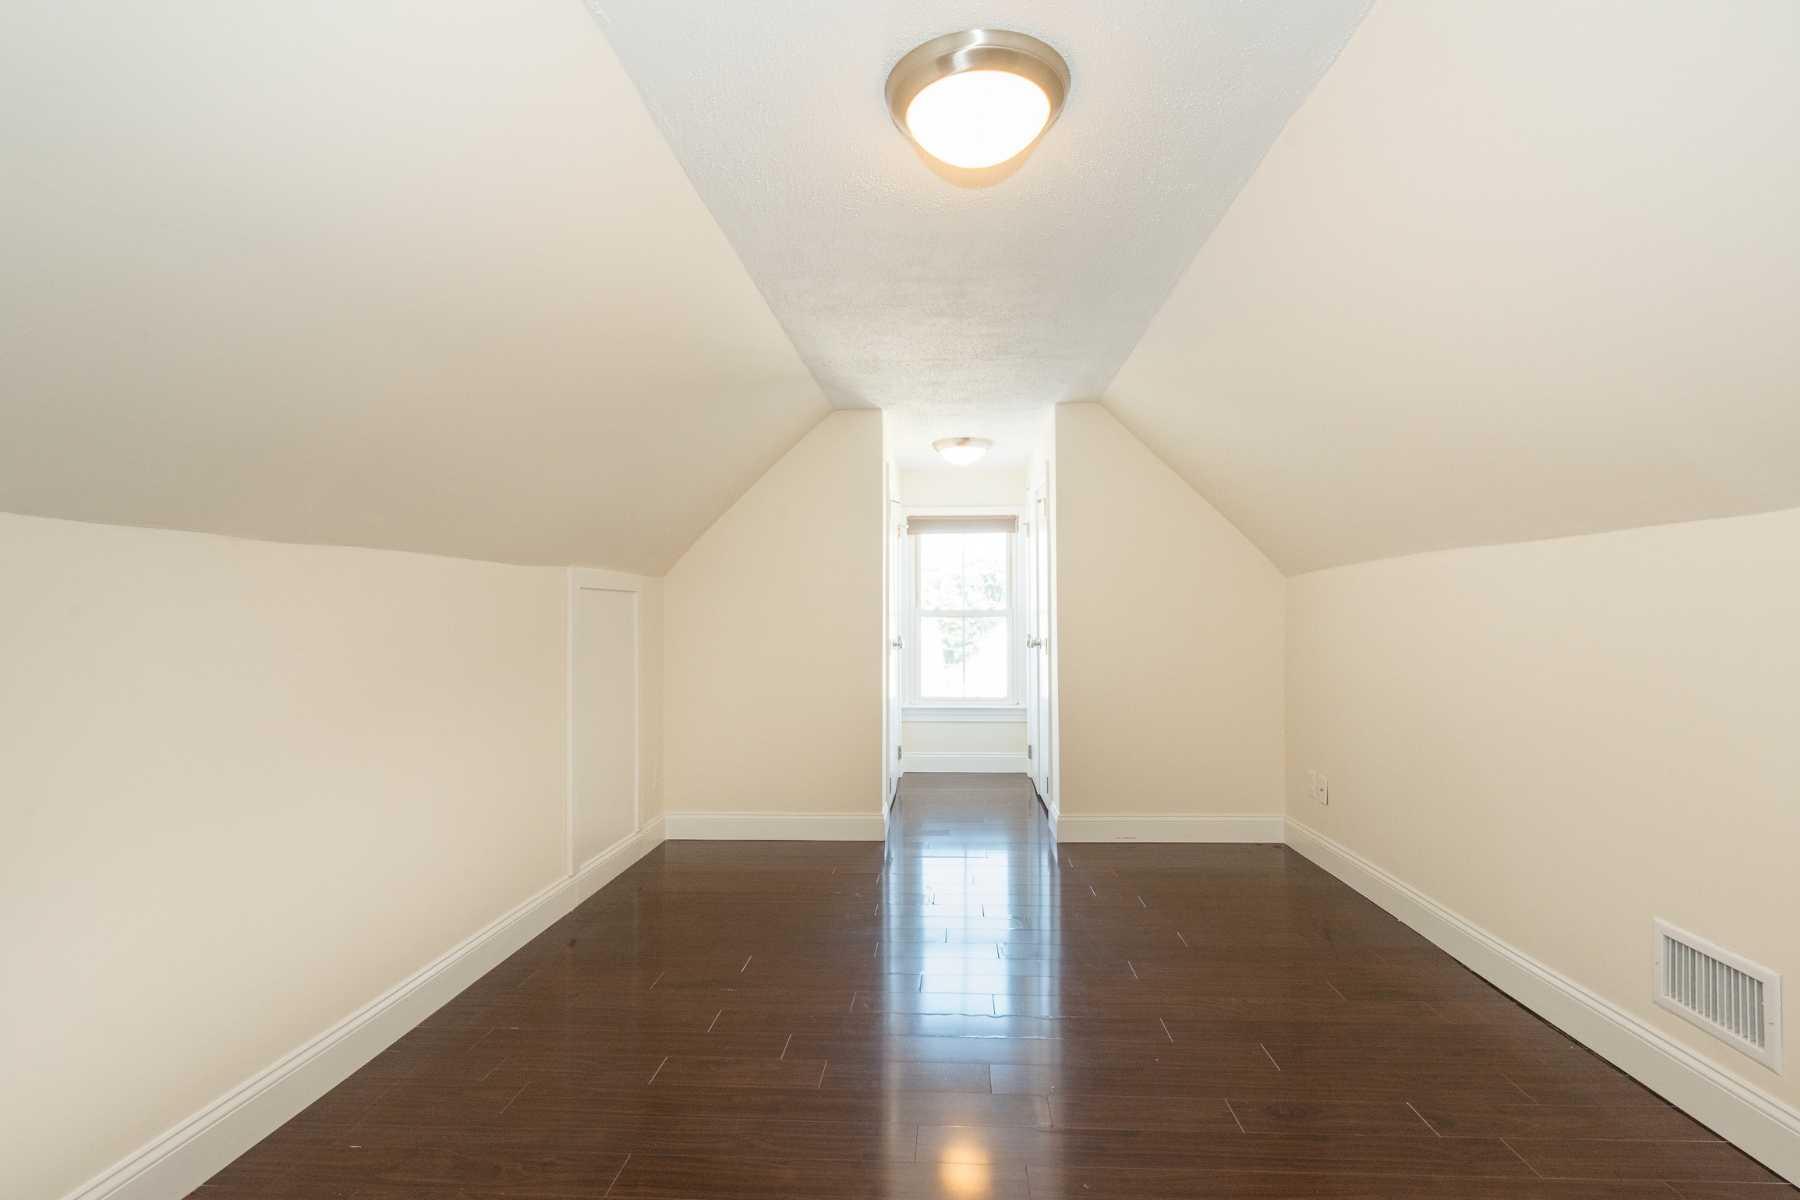 9-CapstoneCommunities-property-Dickinson-Street-Apartments-Somerville.jpg